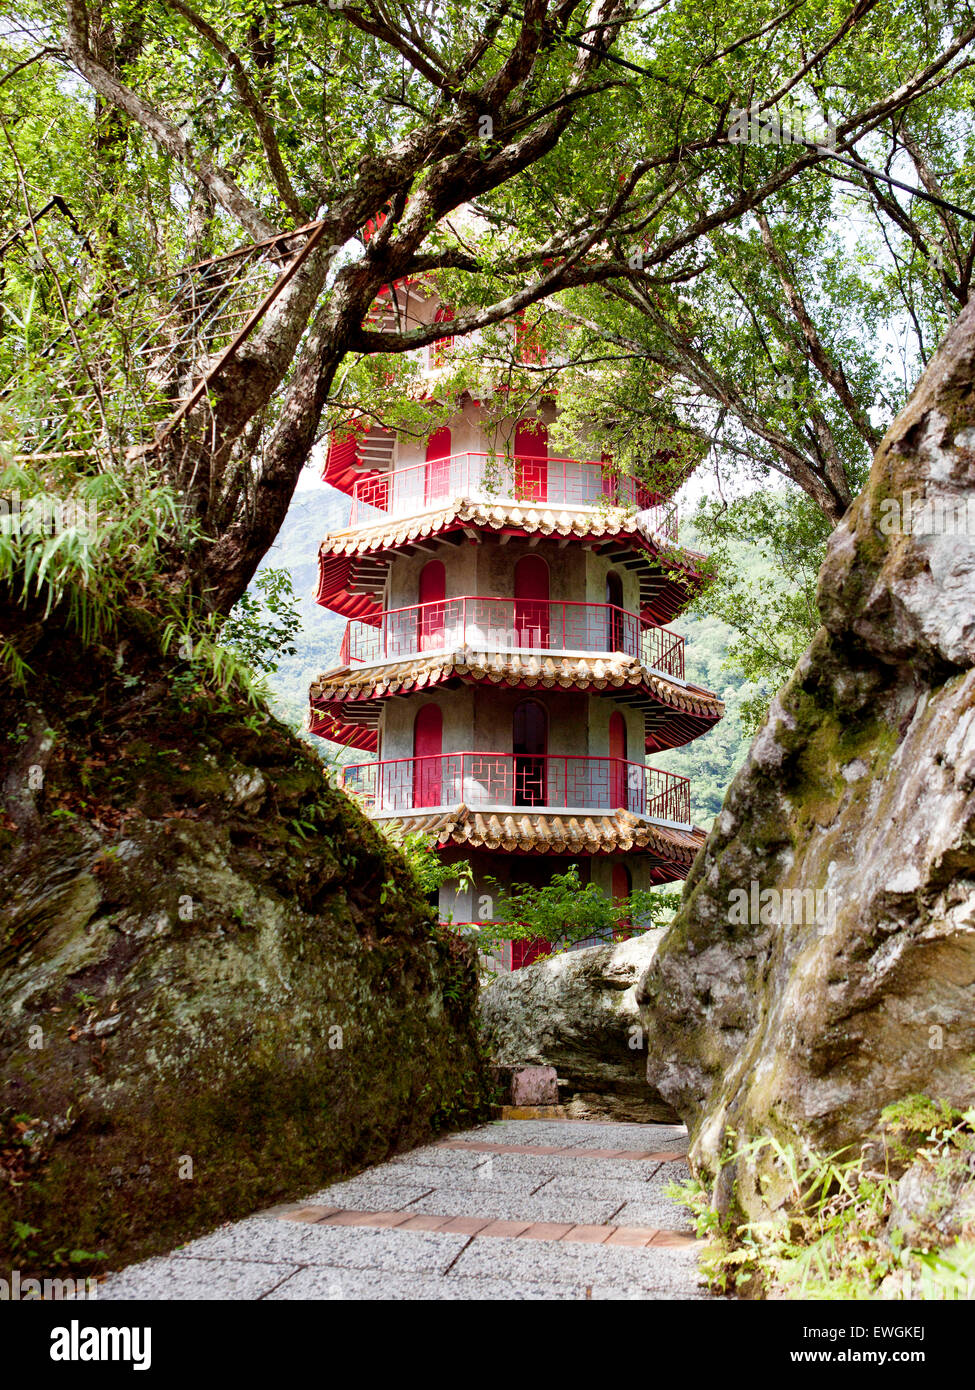 Hsiang-te (Tienhsiang ) pagode. Les Gorges de Taroko. Taïwan. Photo Stock